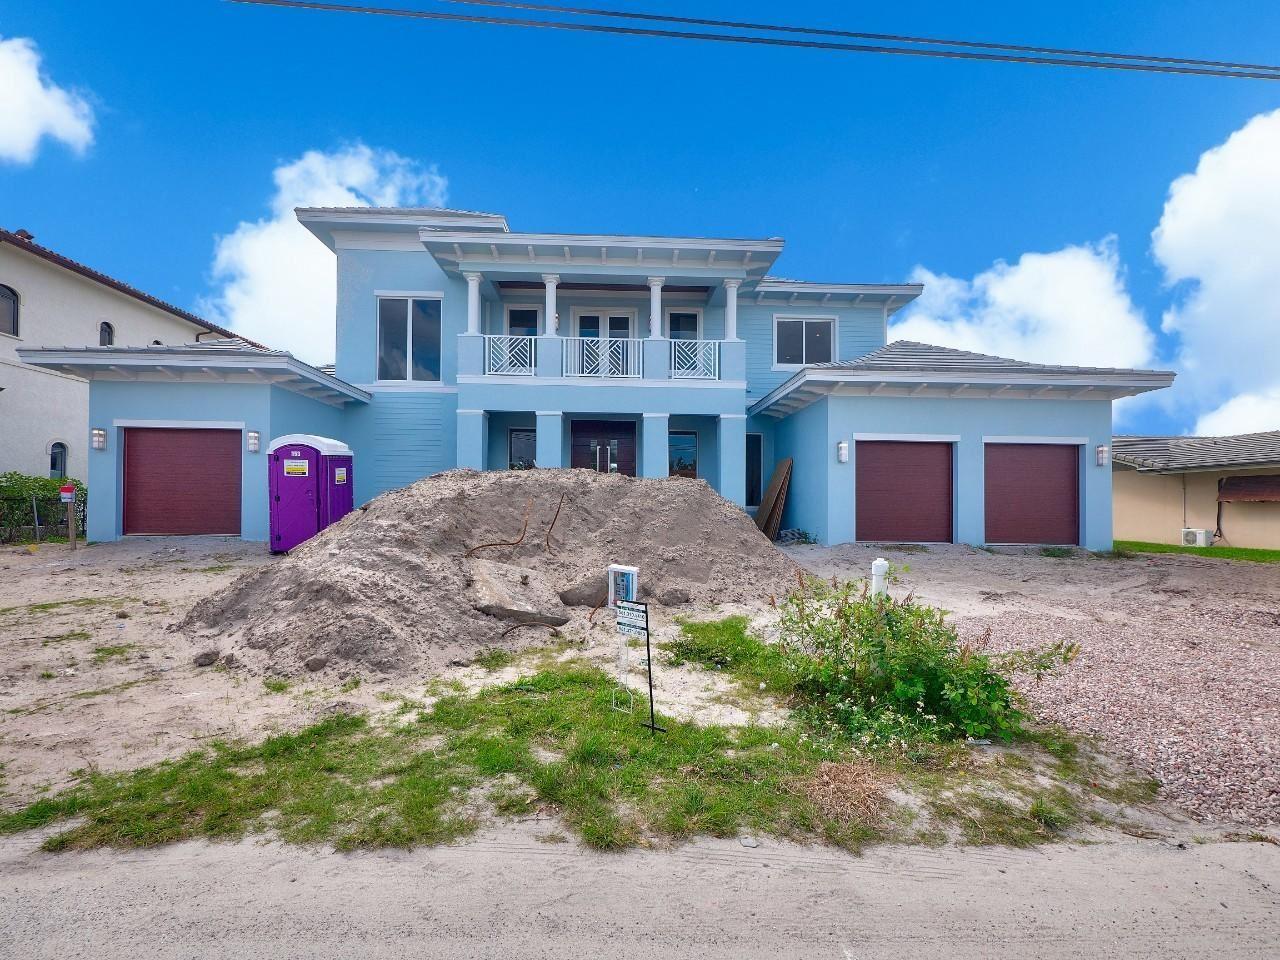 Photo of 1161 Coral Way, Singer Island, FL 33404 (MLS # RX-10623201)